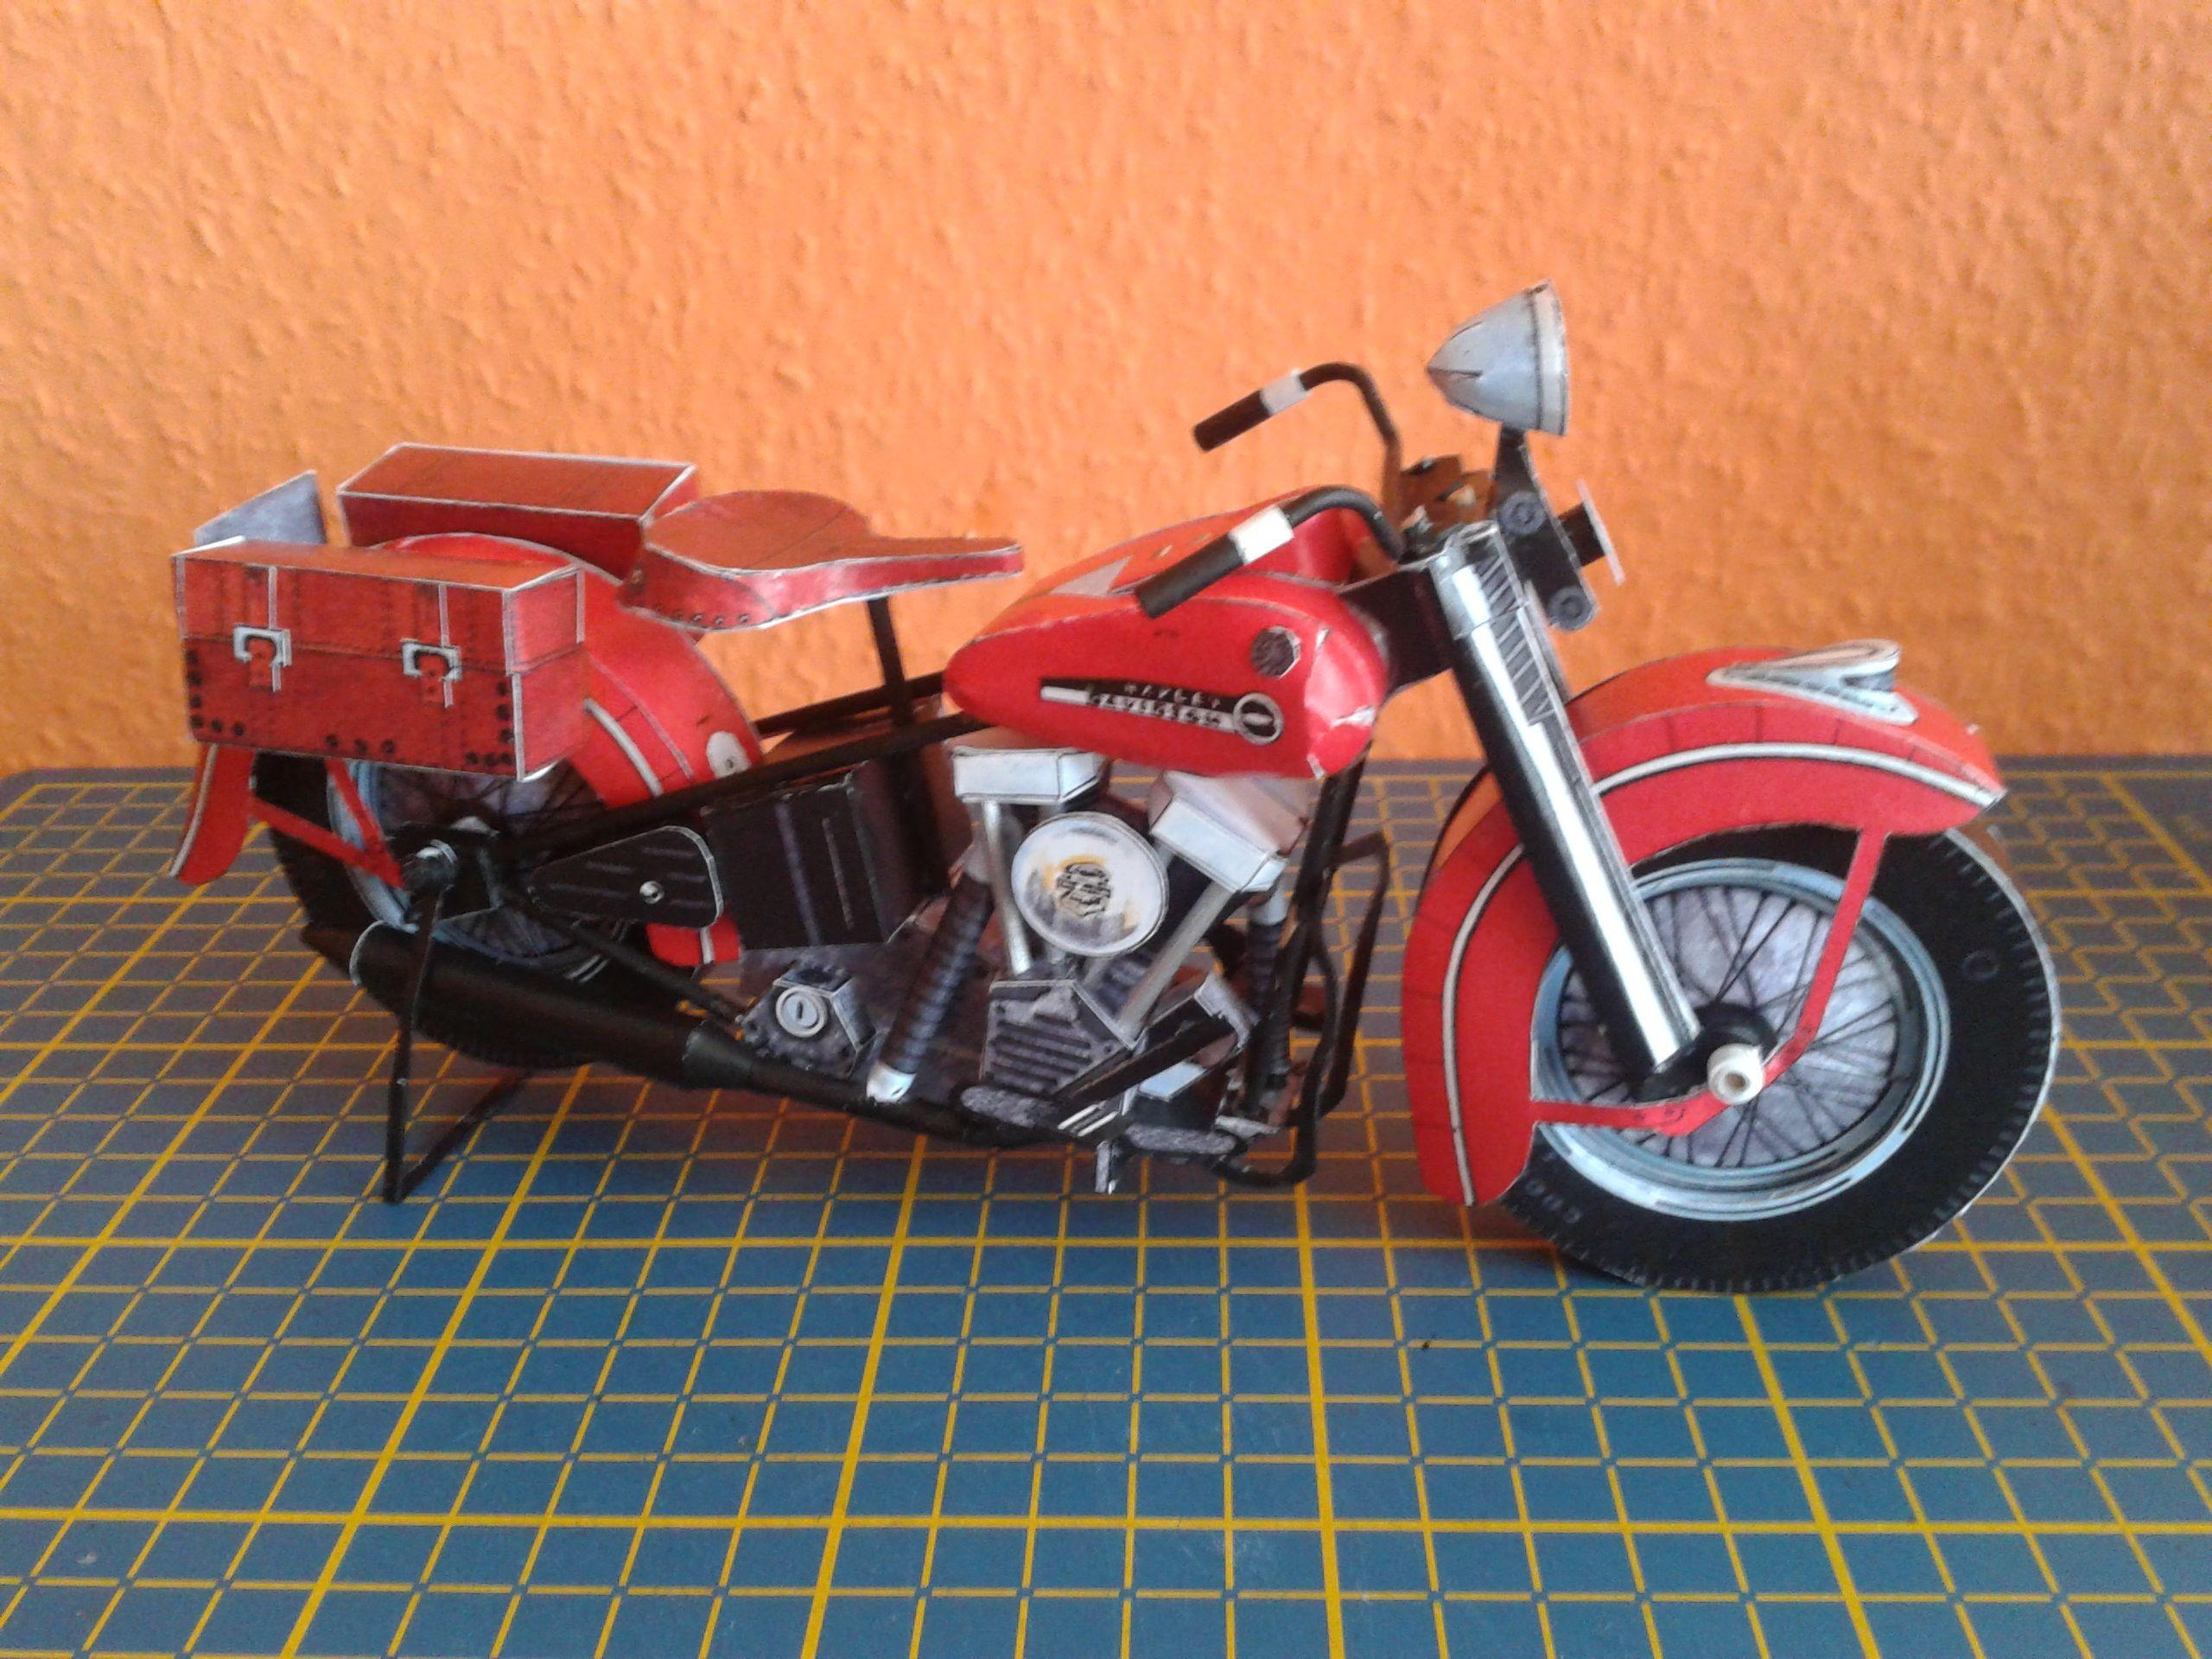 Motorcycle Papercraft Yamaha Papercraft Yamaha Yz450f 450 °f = 232 °c Motorcycle Free